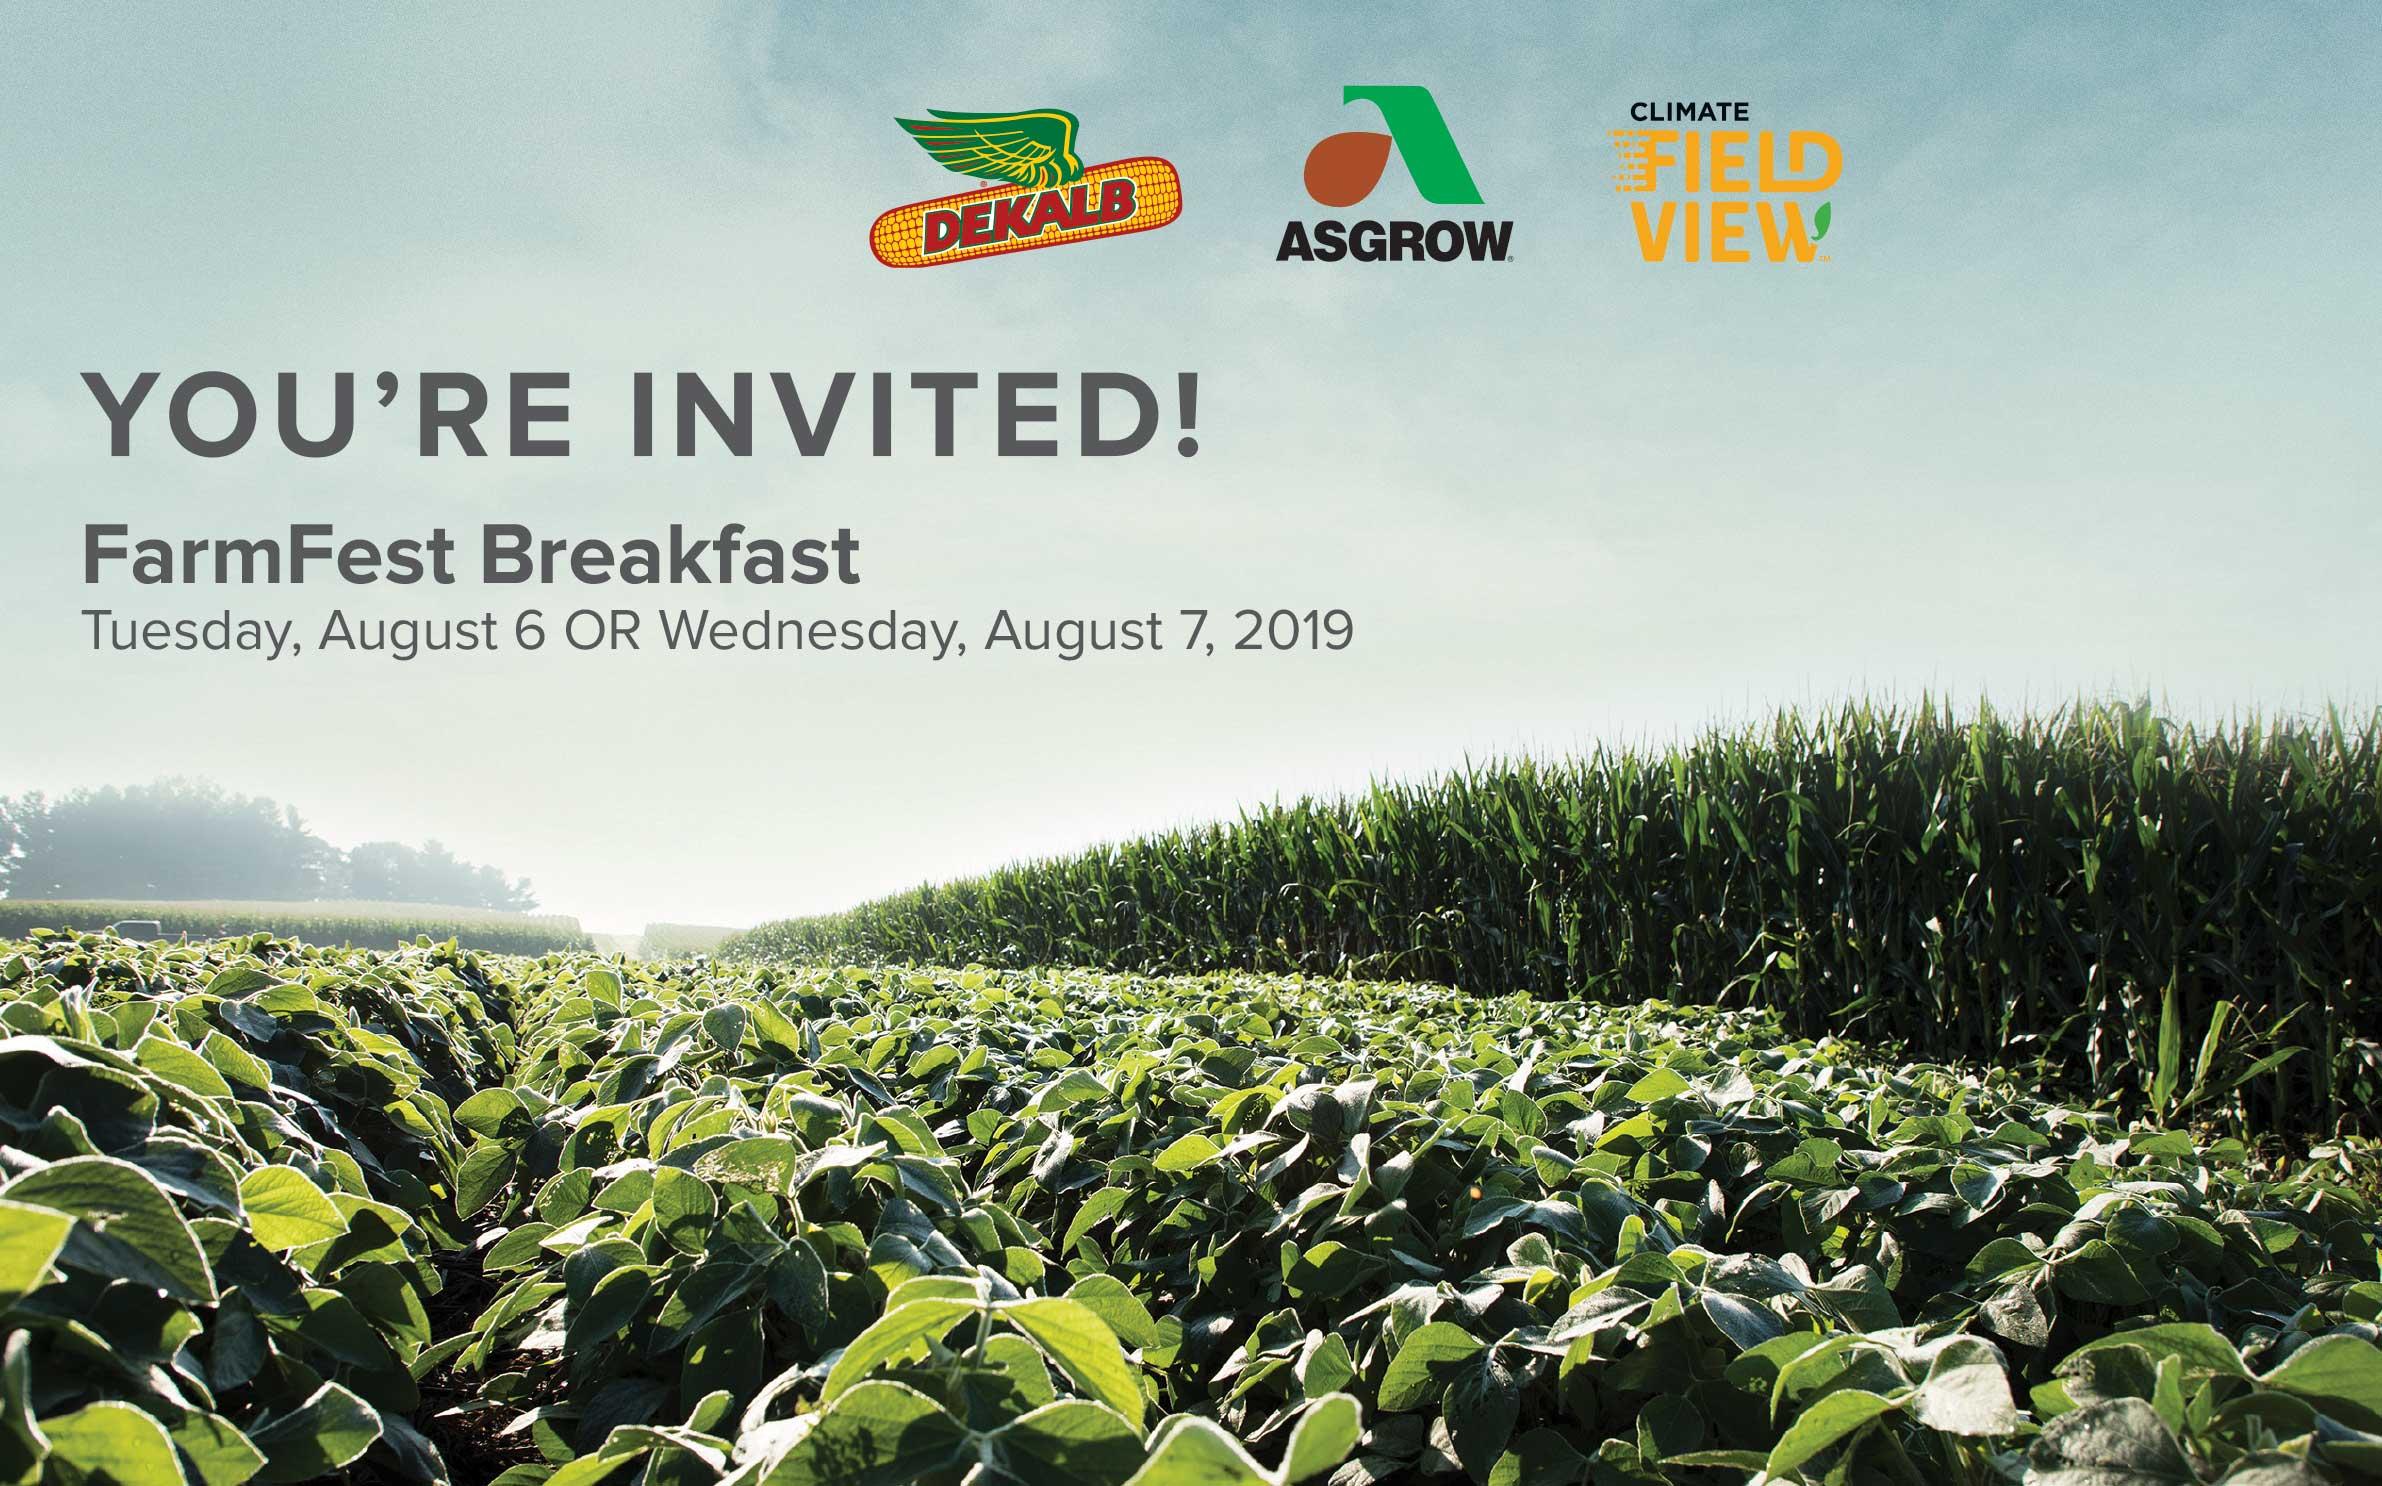 FarmFest Breakfast Invitation